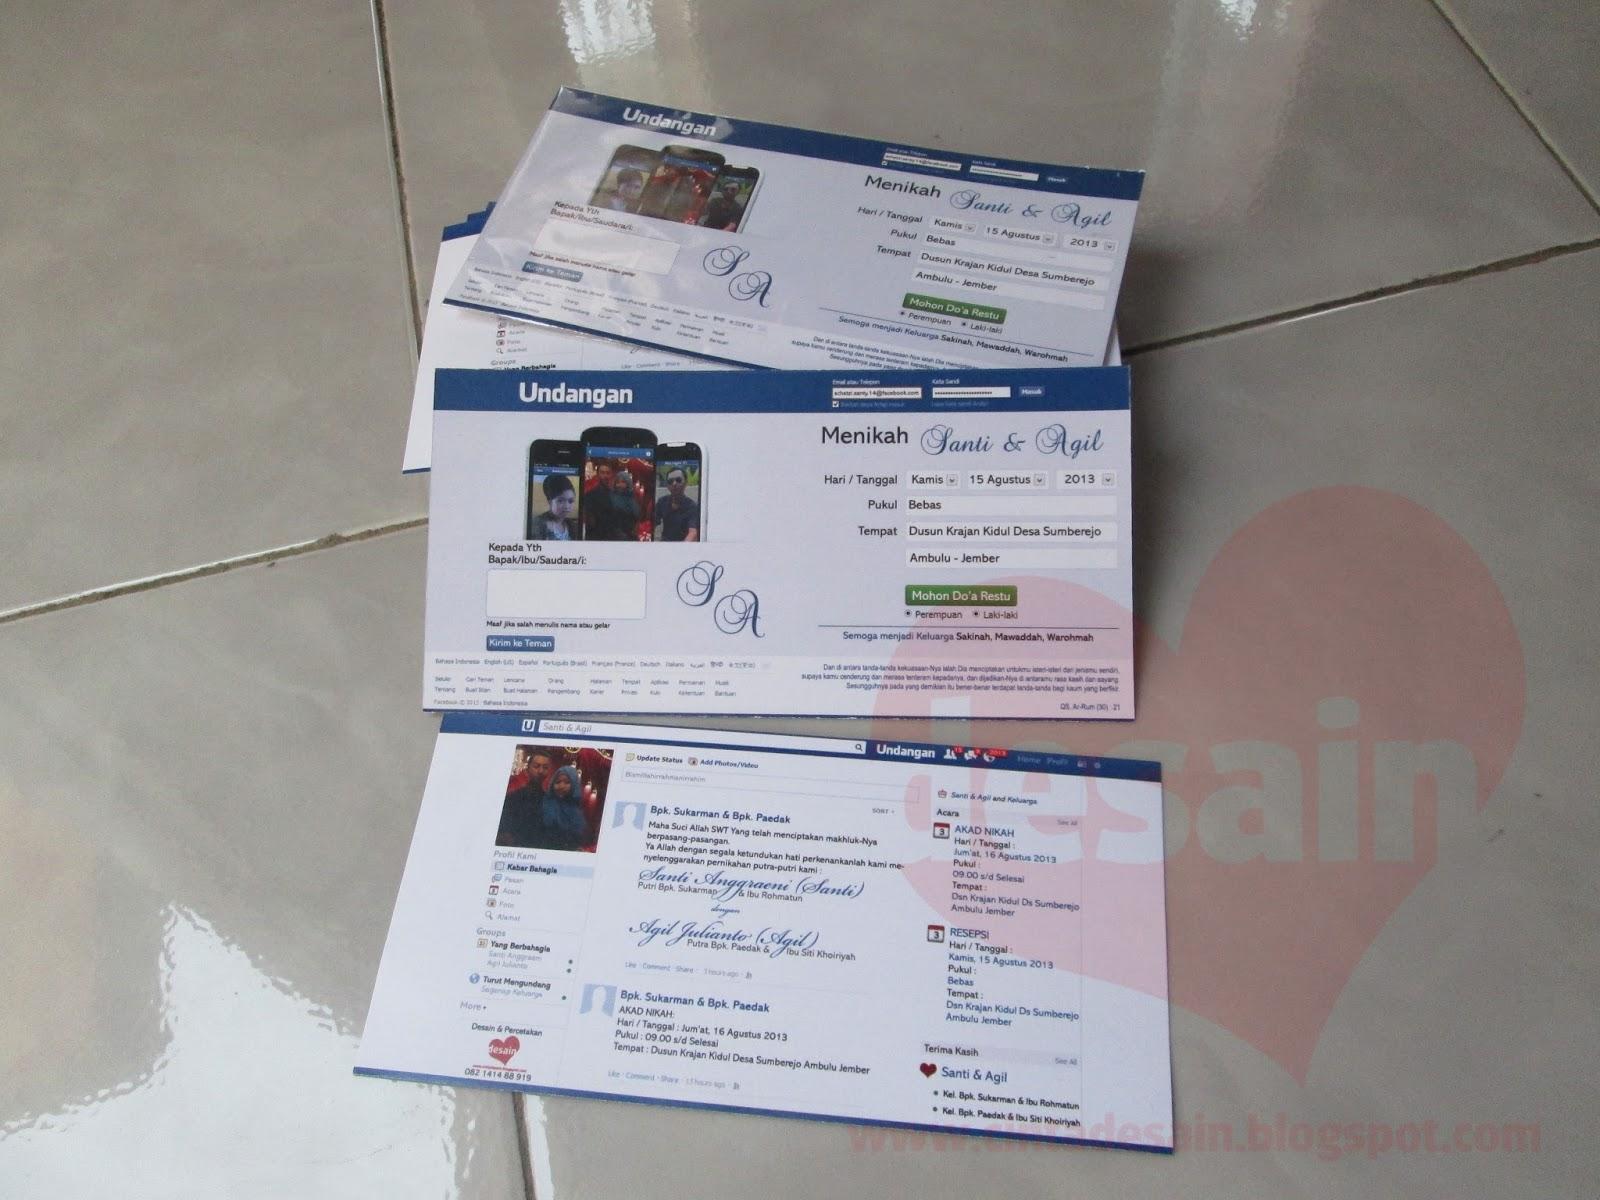 Undangan Model Facebook Format Adobe Photoshop Gratis ~ www.CINTA